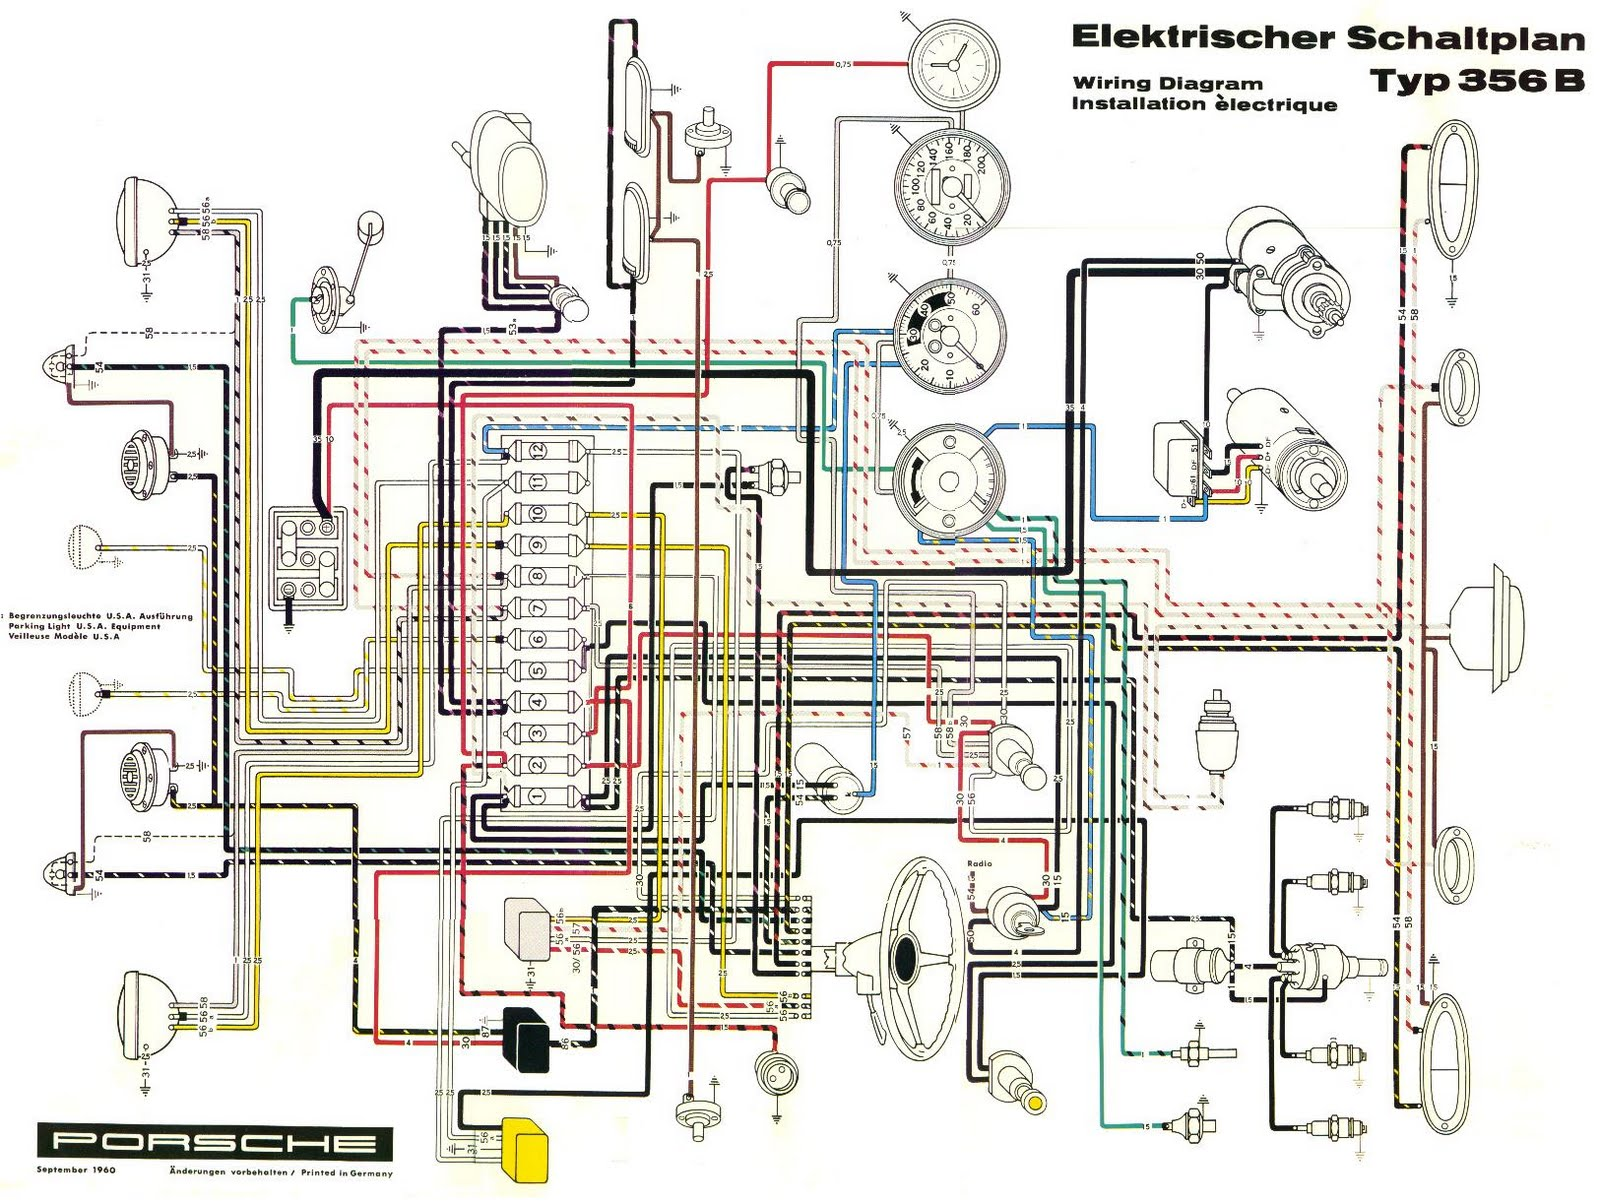 Wire Diagram 1973 Blazer Archive Of Automotive Wiring 95 Corolla Dlc 1972 Chevy Truck Pdf Simple Rh David Huggett Co Uk